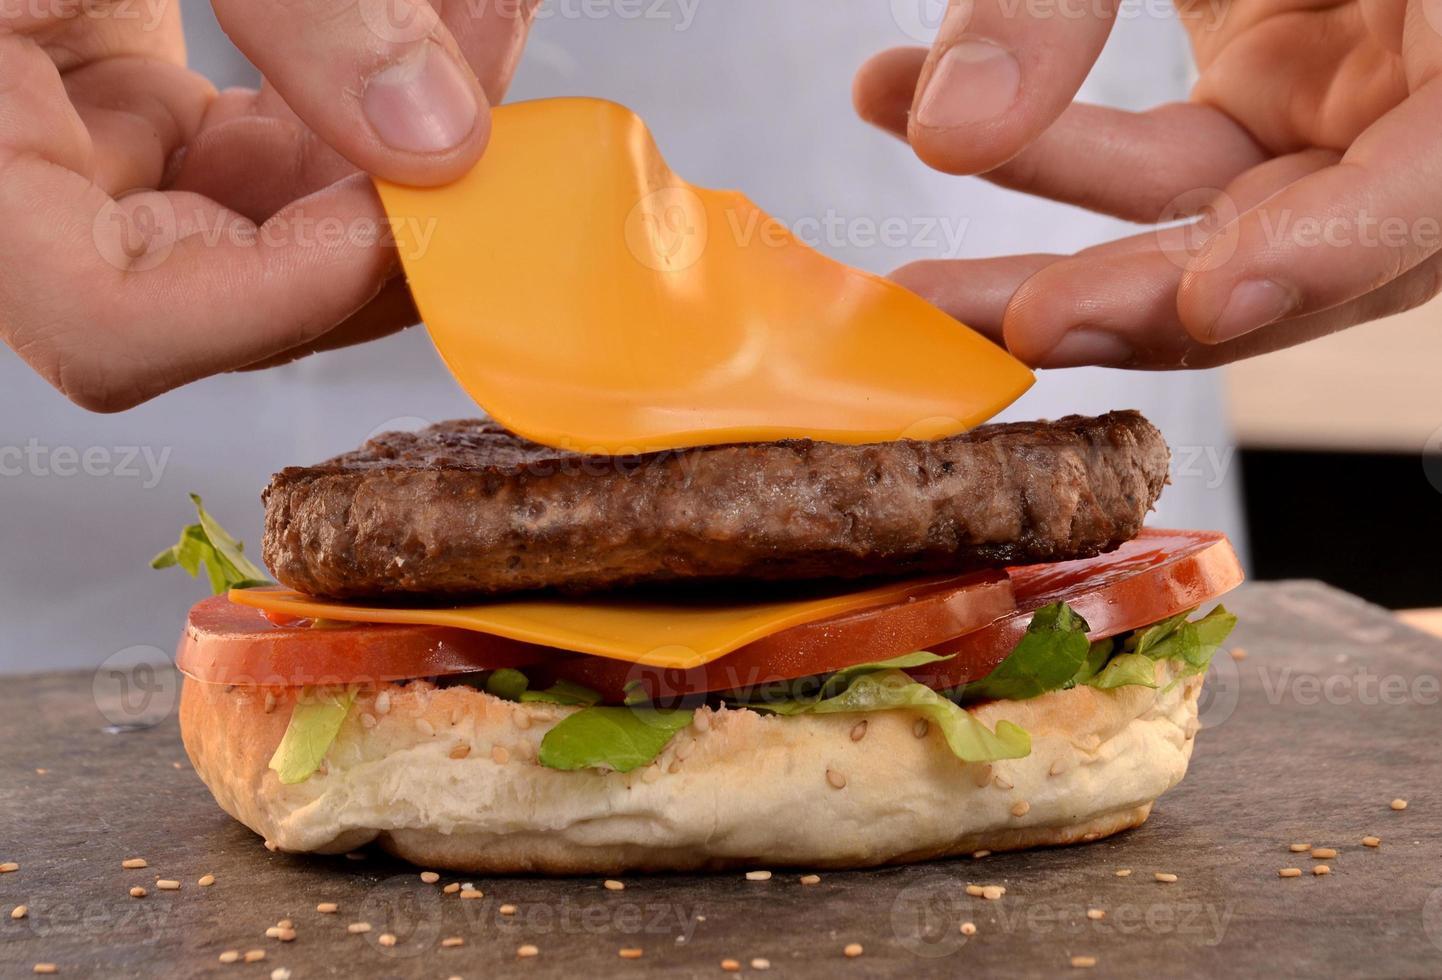 cozinhar hambúrguer. foto